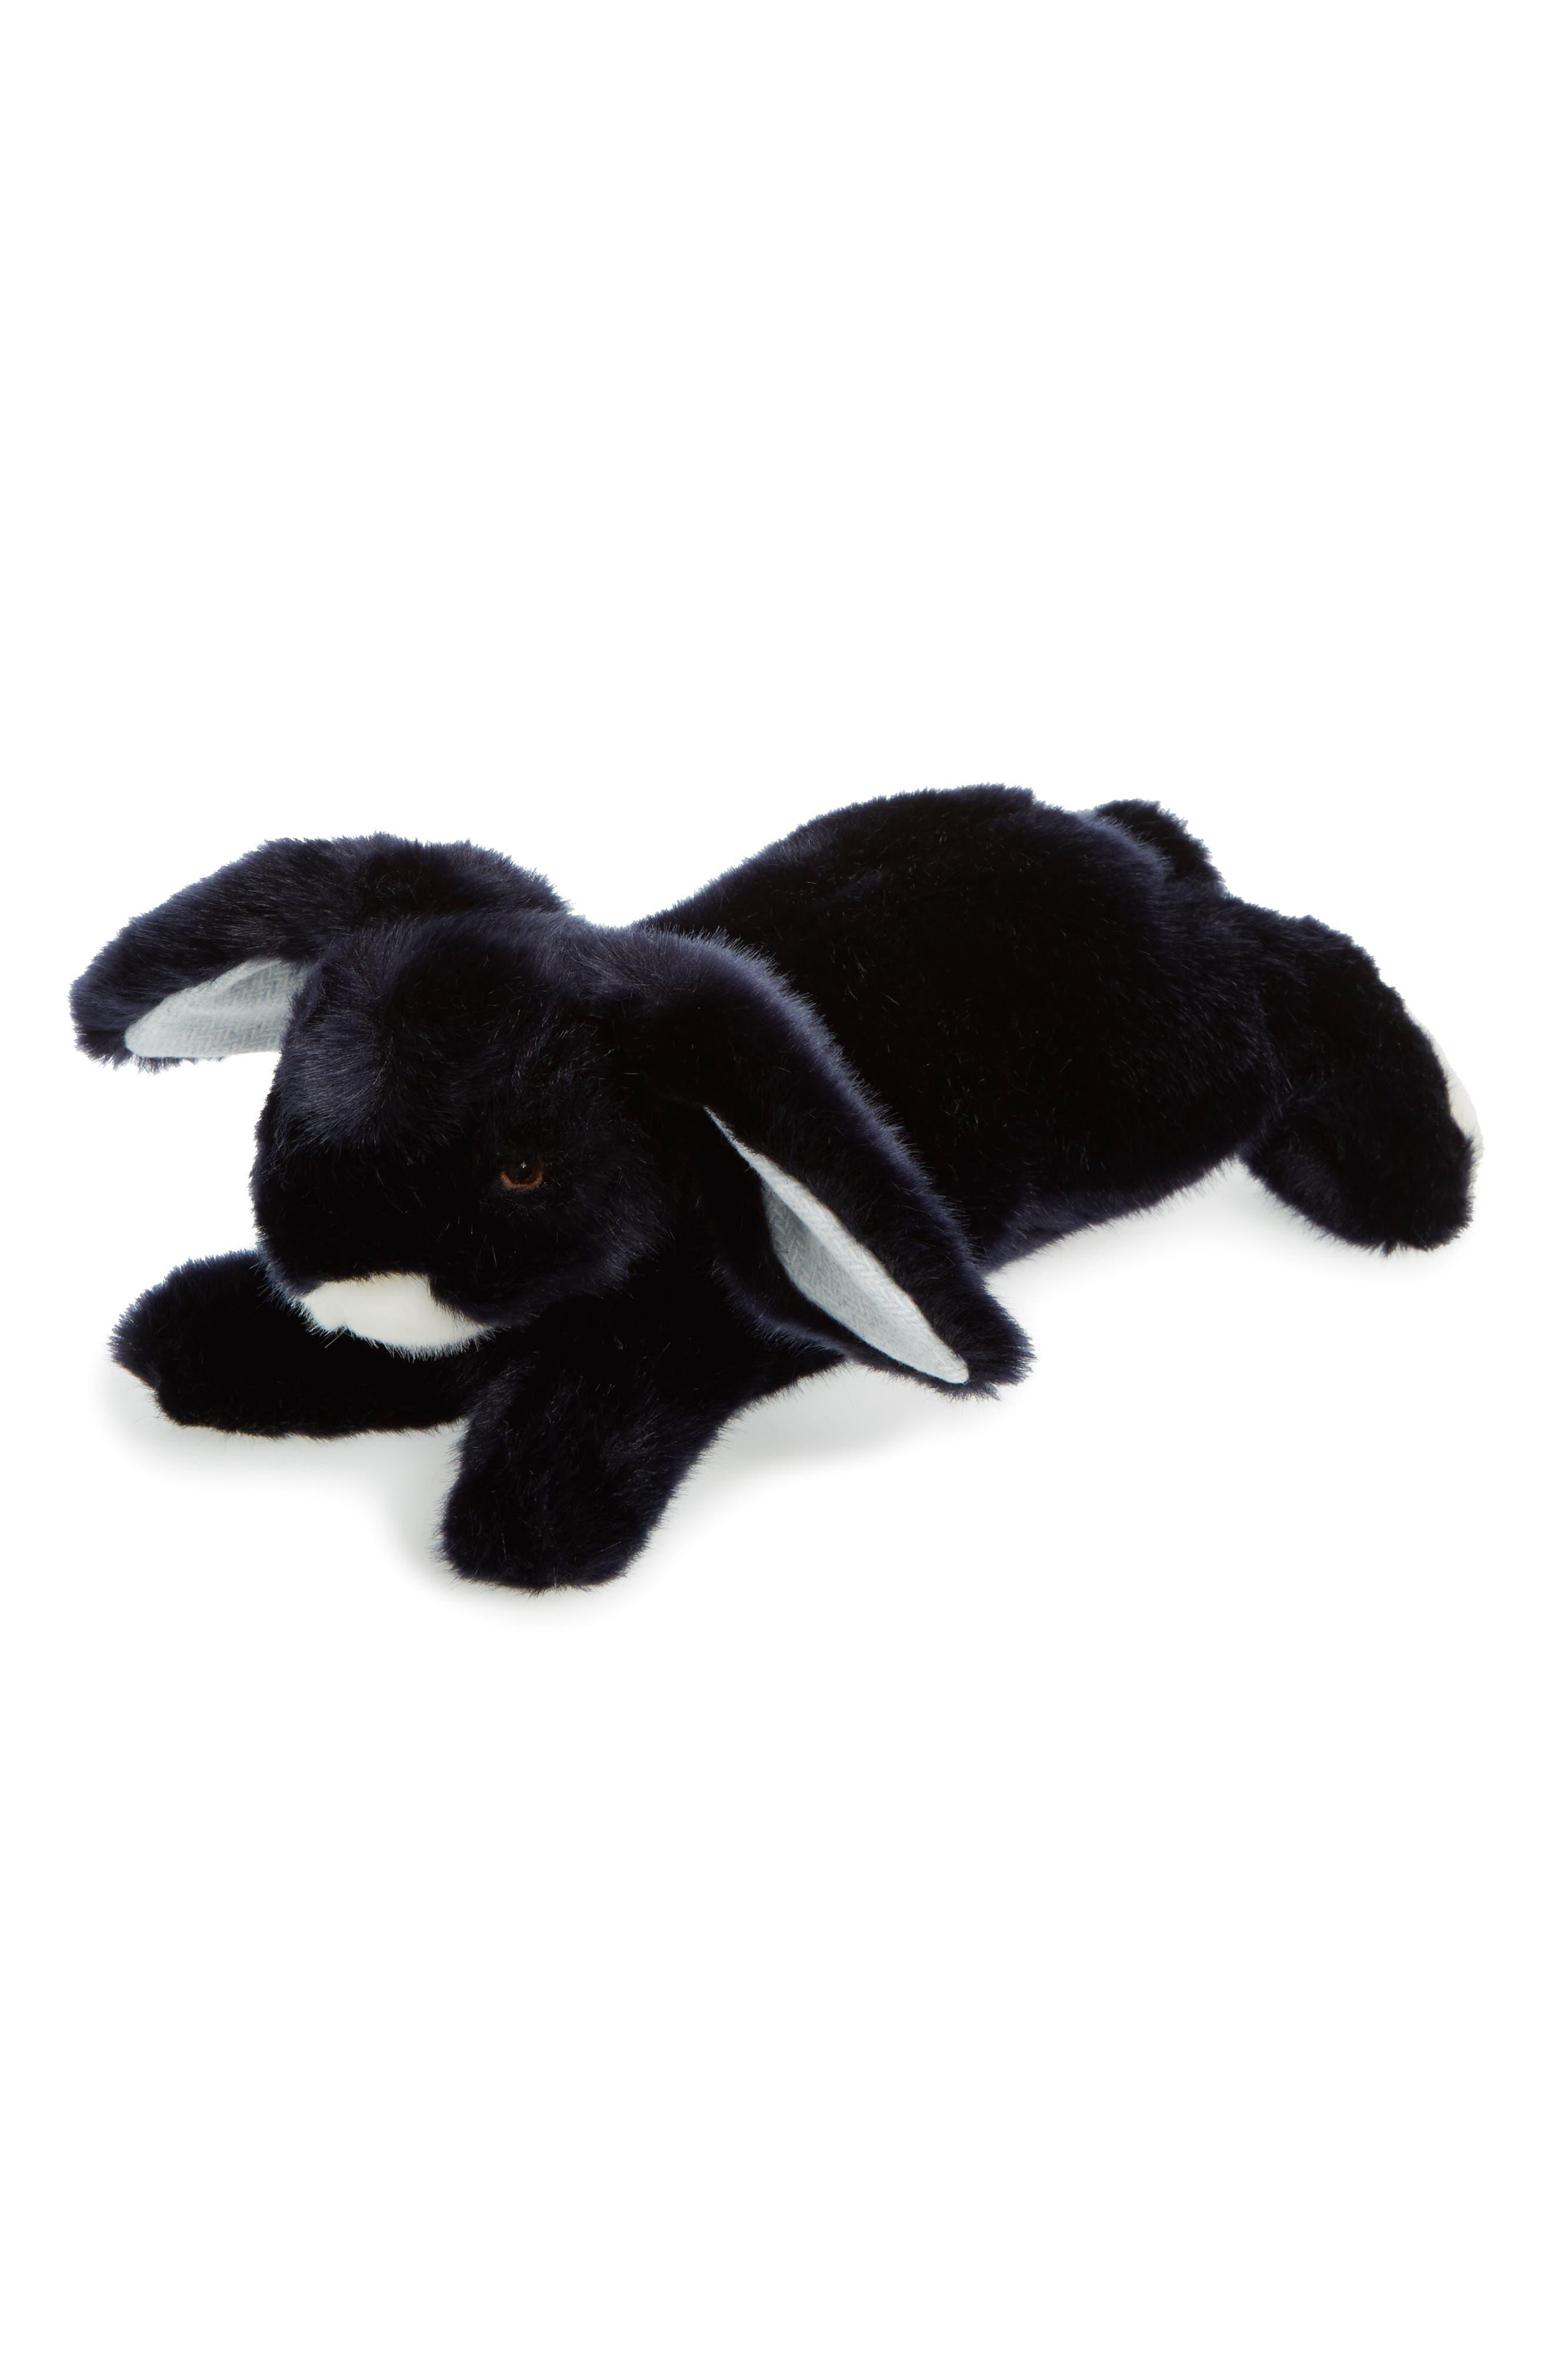 Main Image - Pamplemousse Peluches x Liberty of London Martin the Rabbit Stuffed Animal